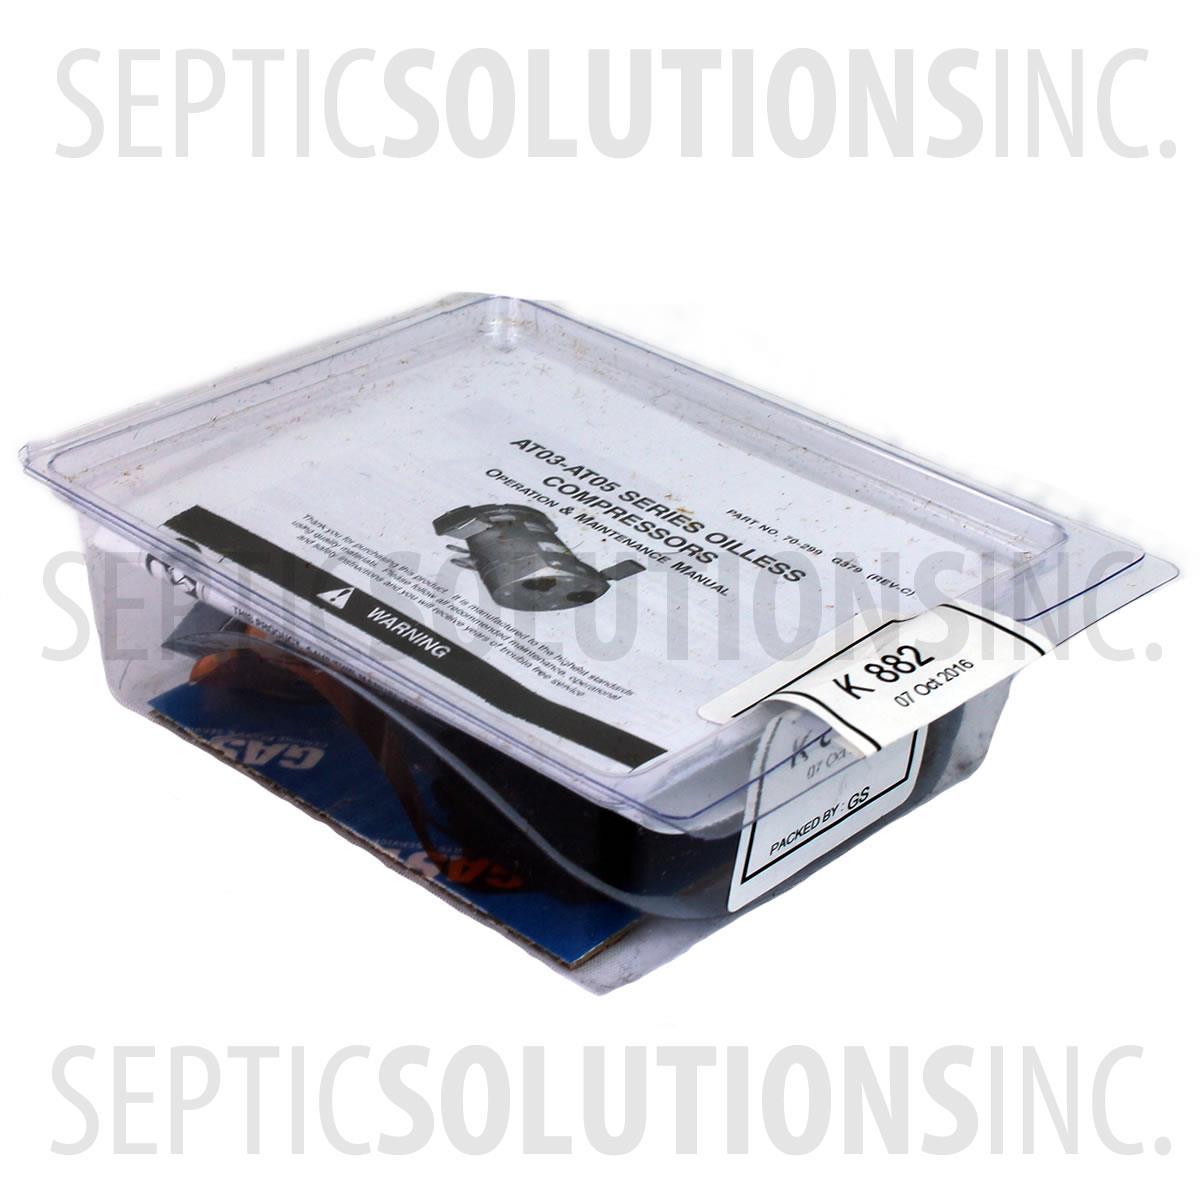 Gast Rotary Vane Repair Kit K882 For Models 0323 0523